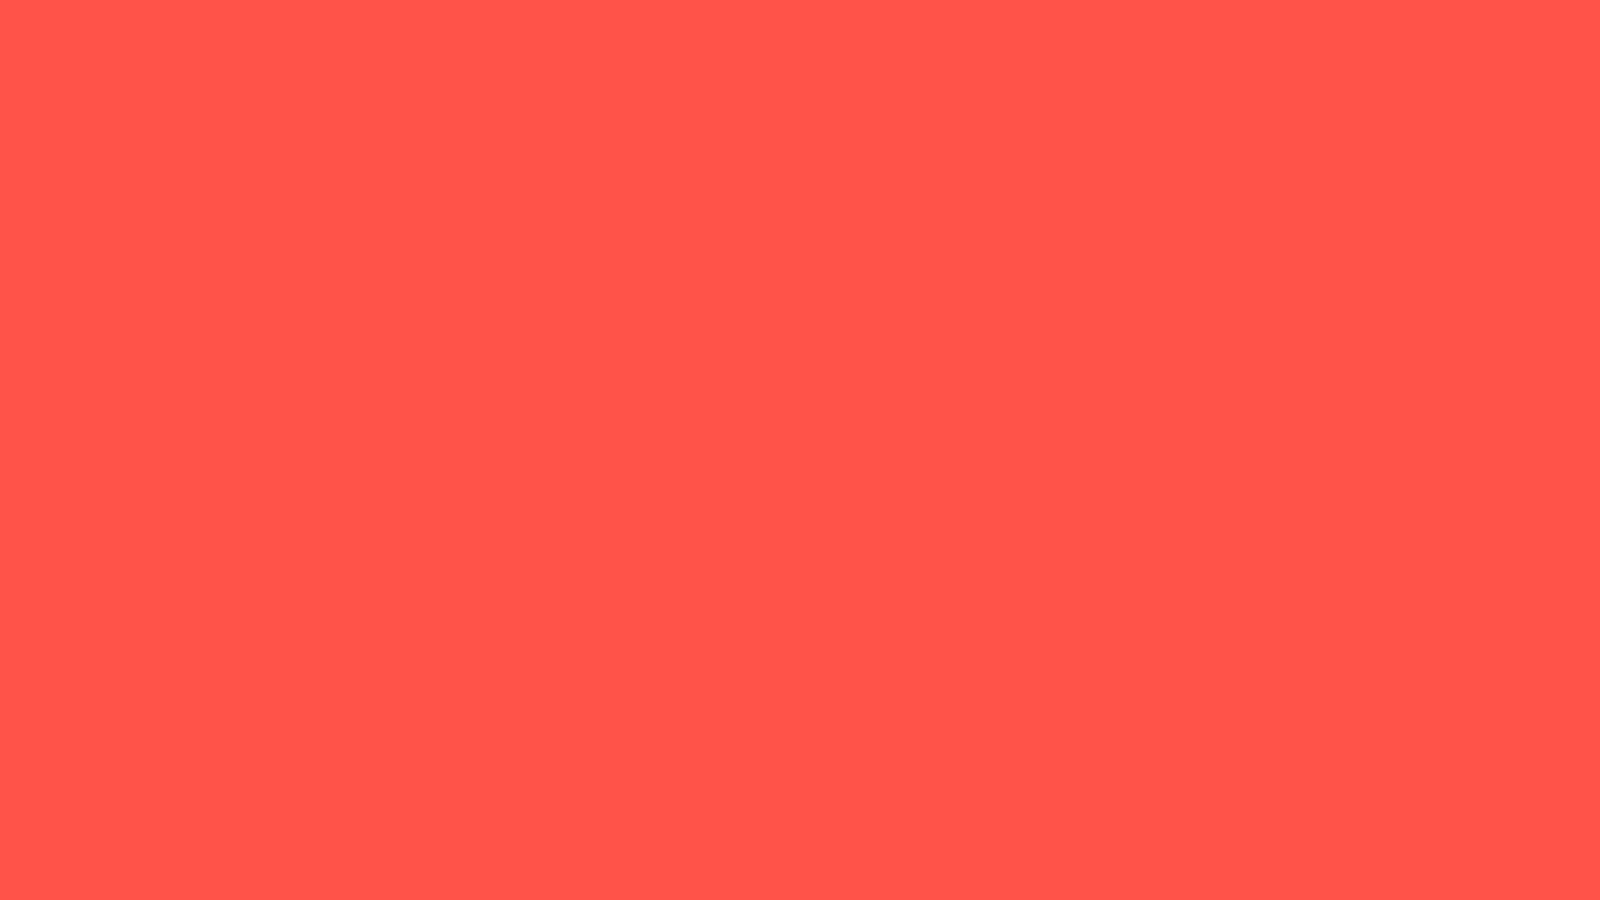 1600x900 red orange solid color background